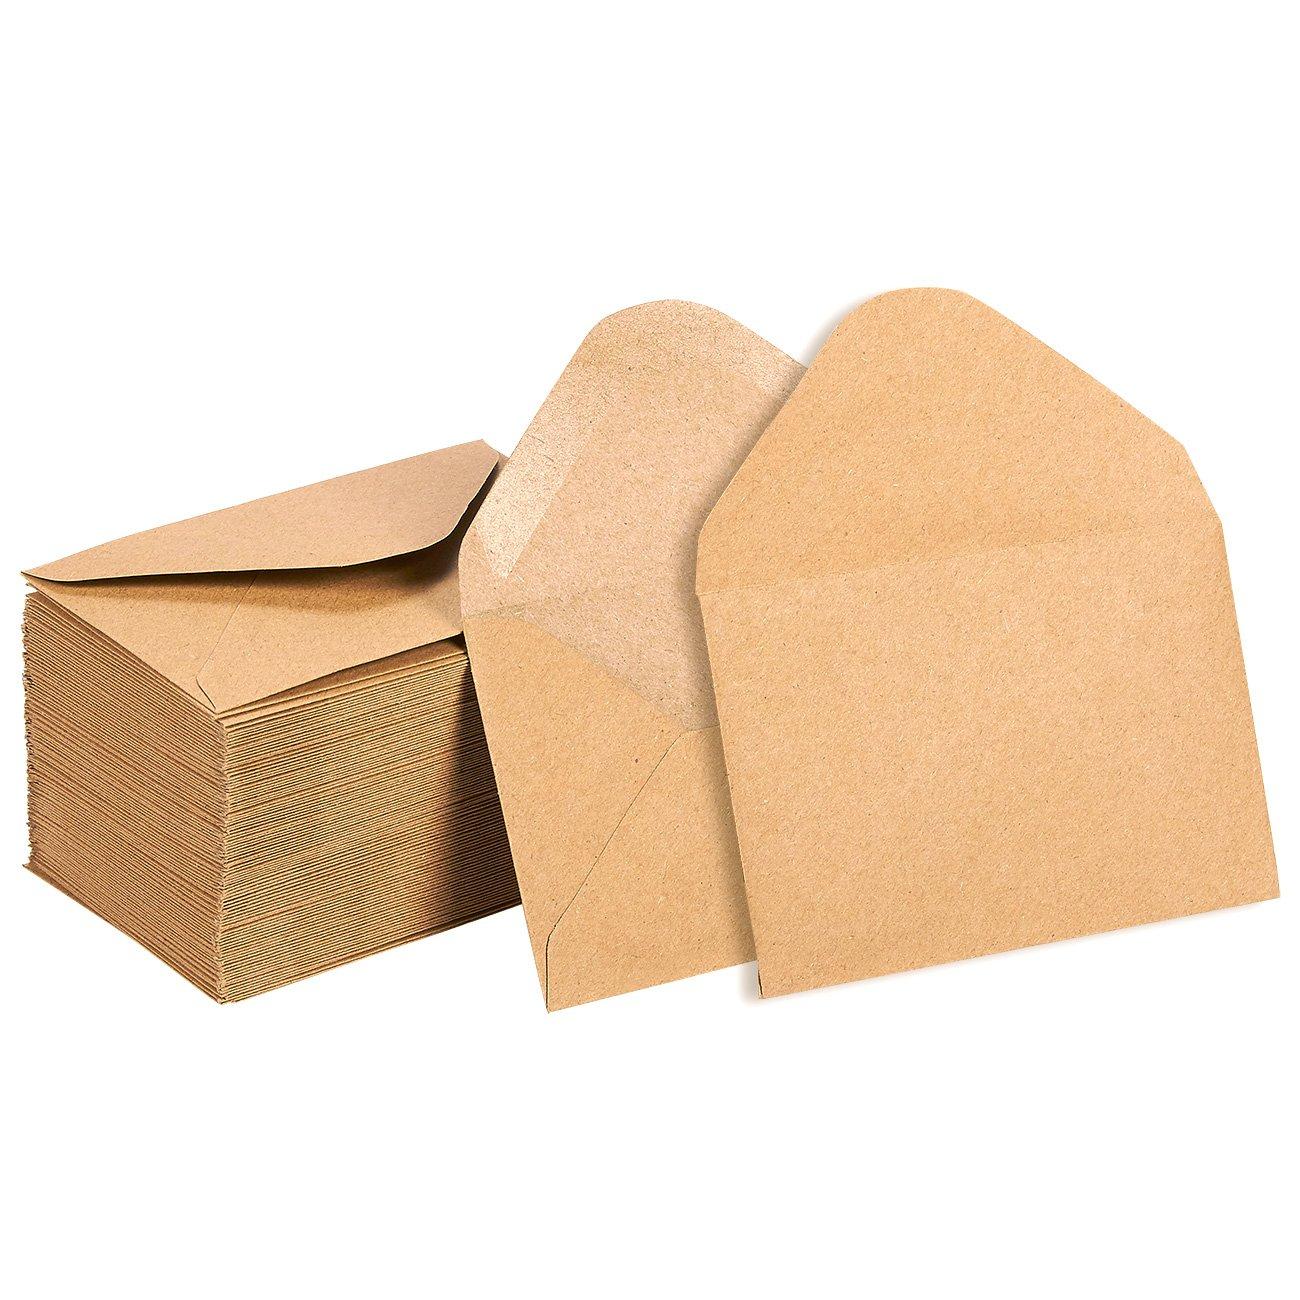 100 Pack Kraft Mini Envelopes - Gift Card Envelopes - Business Card Envelopes - Value Pack Classic Flap Envelopes - 4.1 x 2.75 inches - 100 Count, Kraft